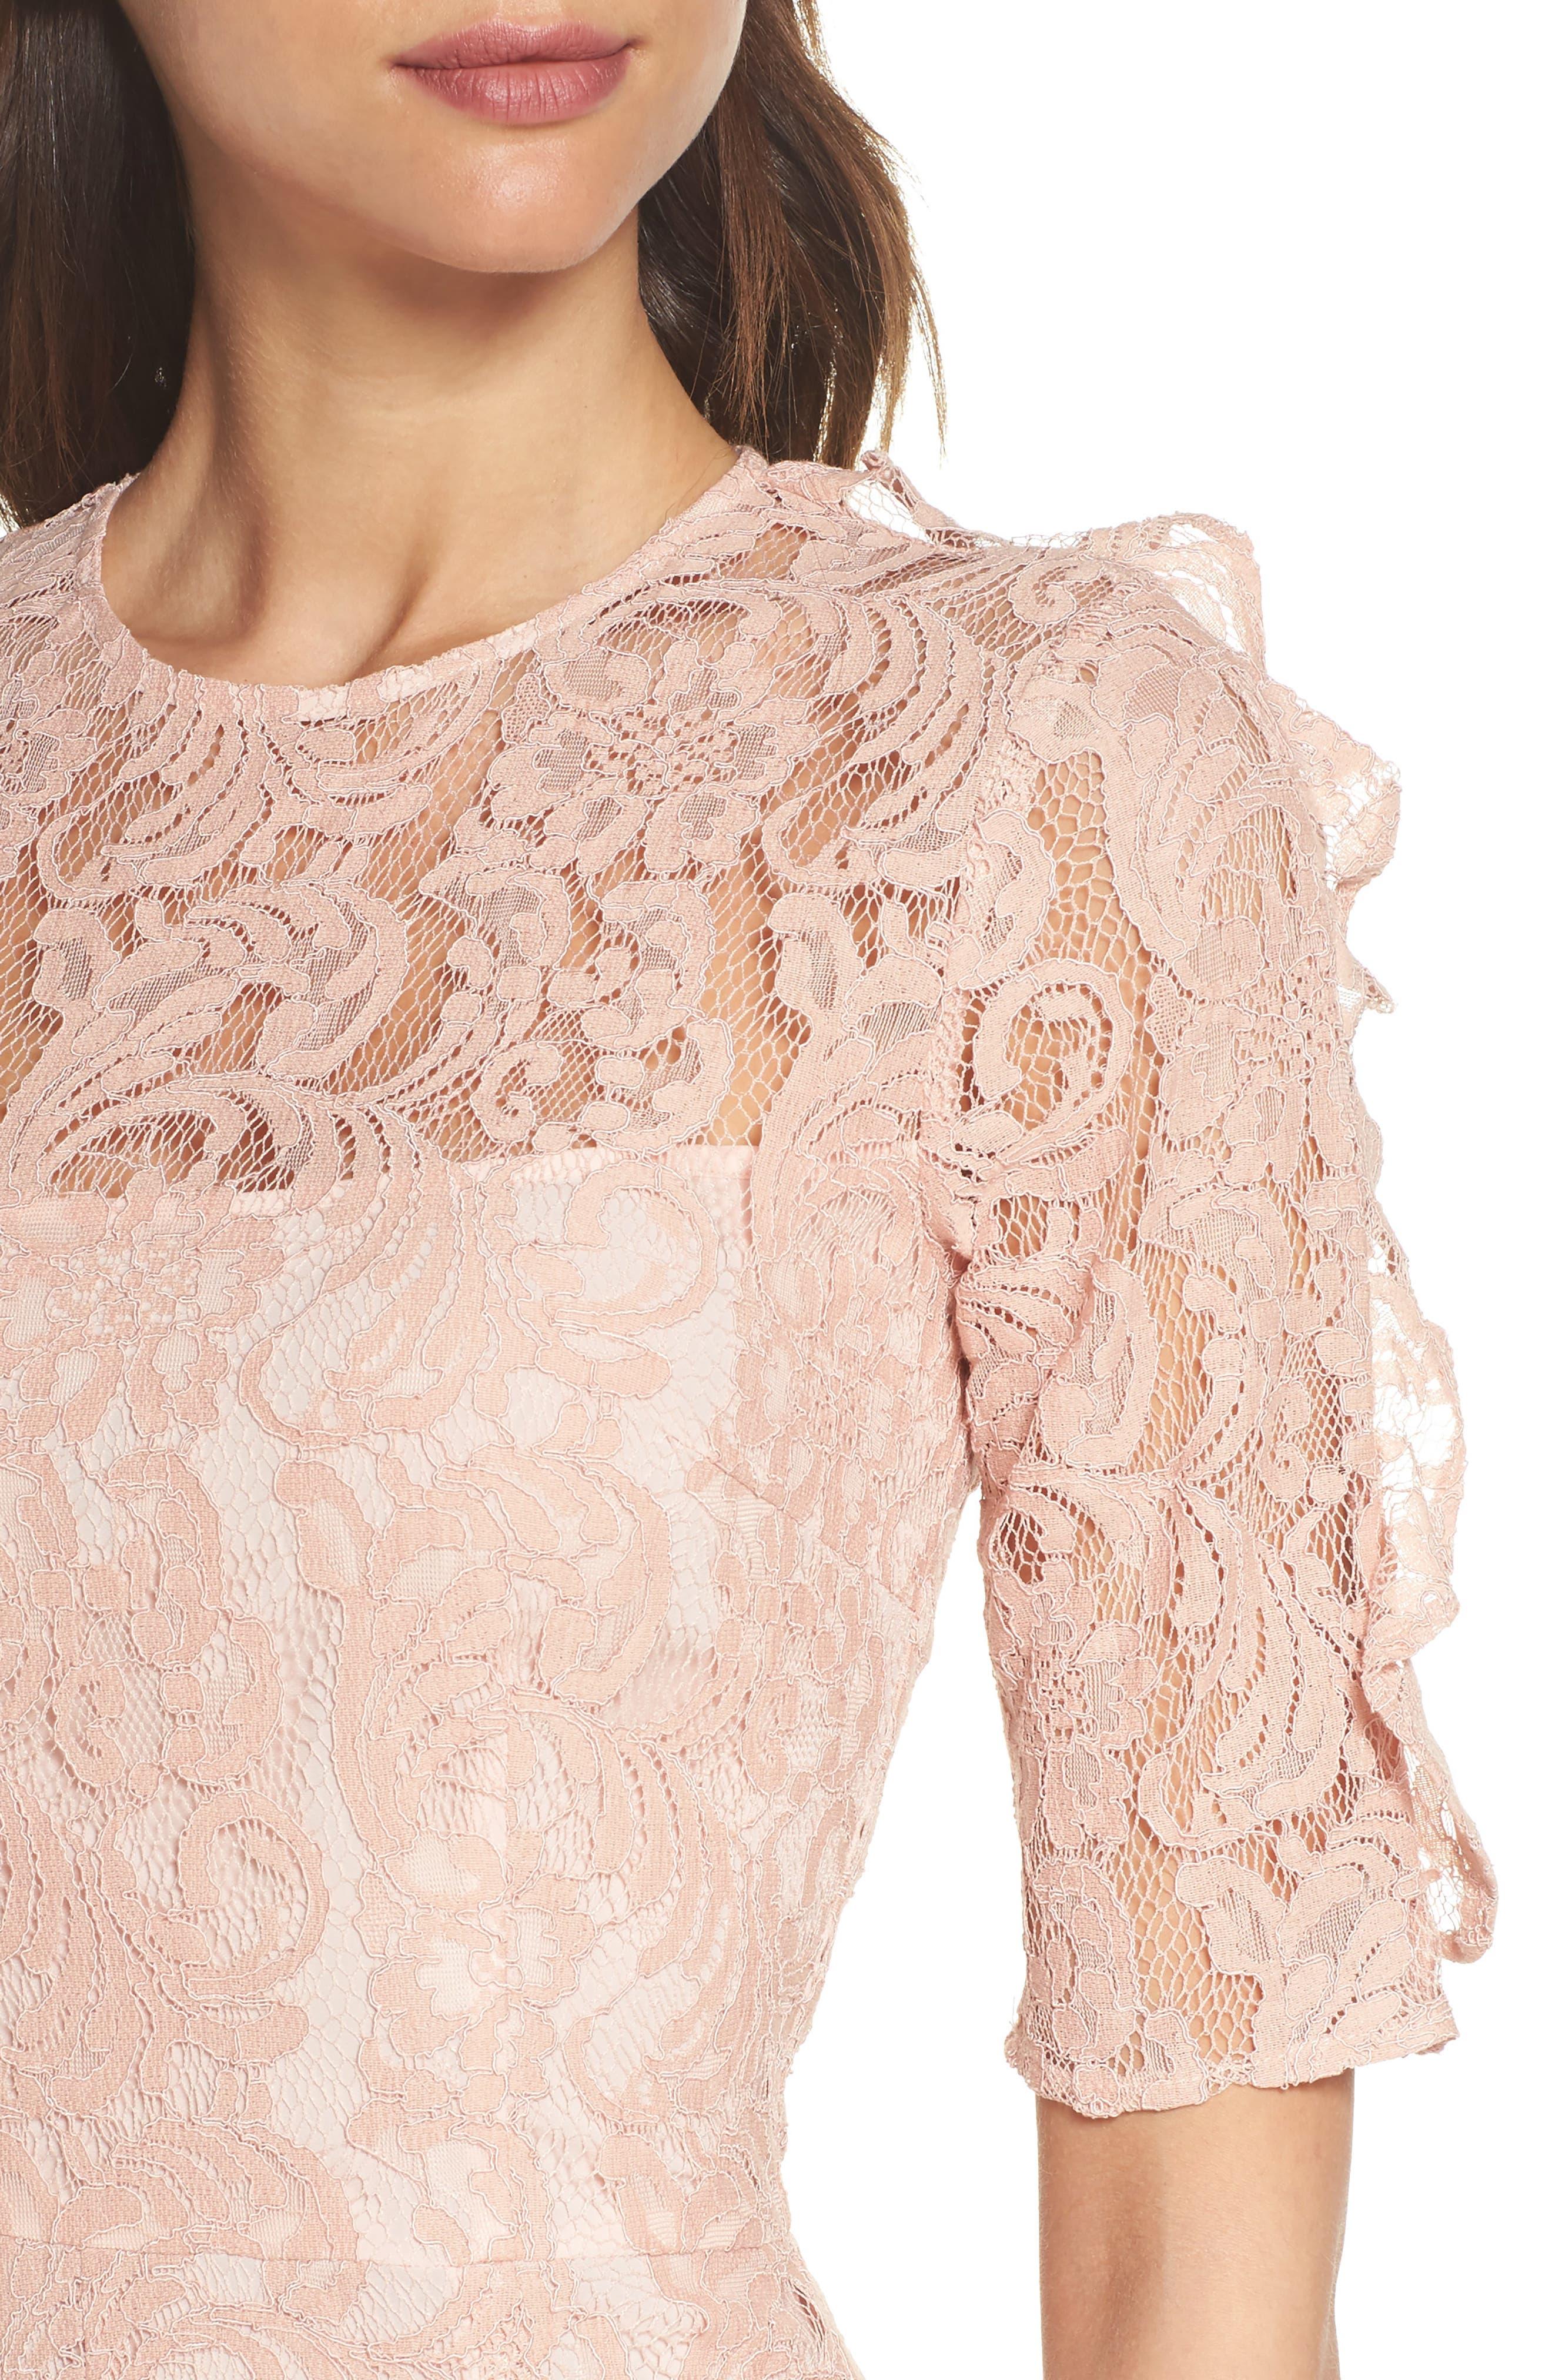 Hushed Dove Lace Dress,                             Alternate thumbnail 4, color,                             Rose Cloud